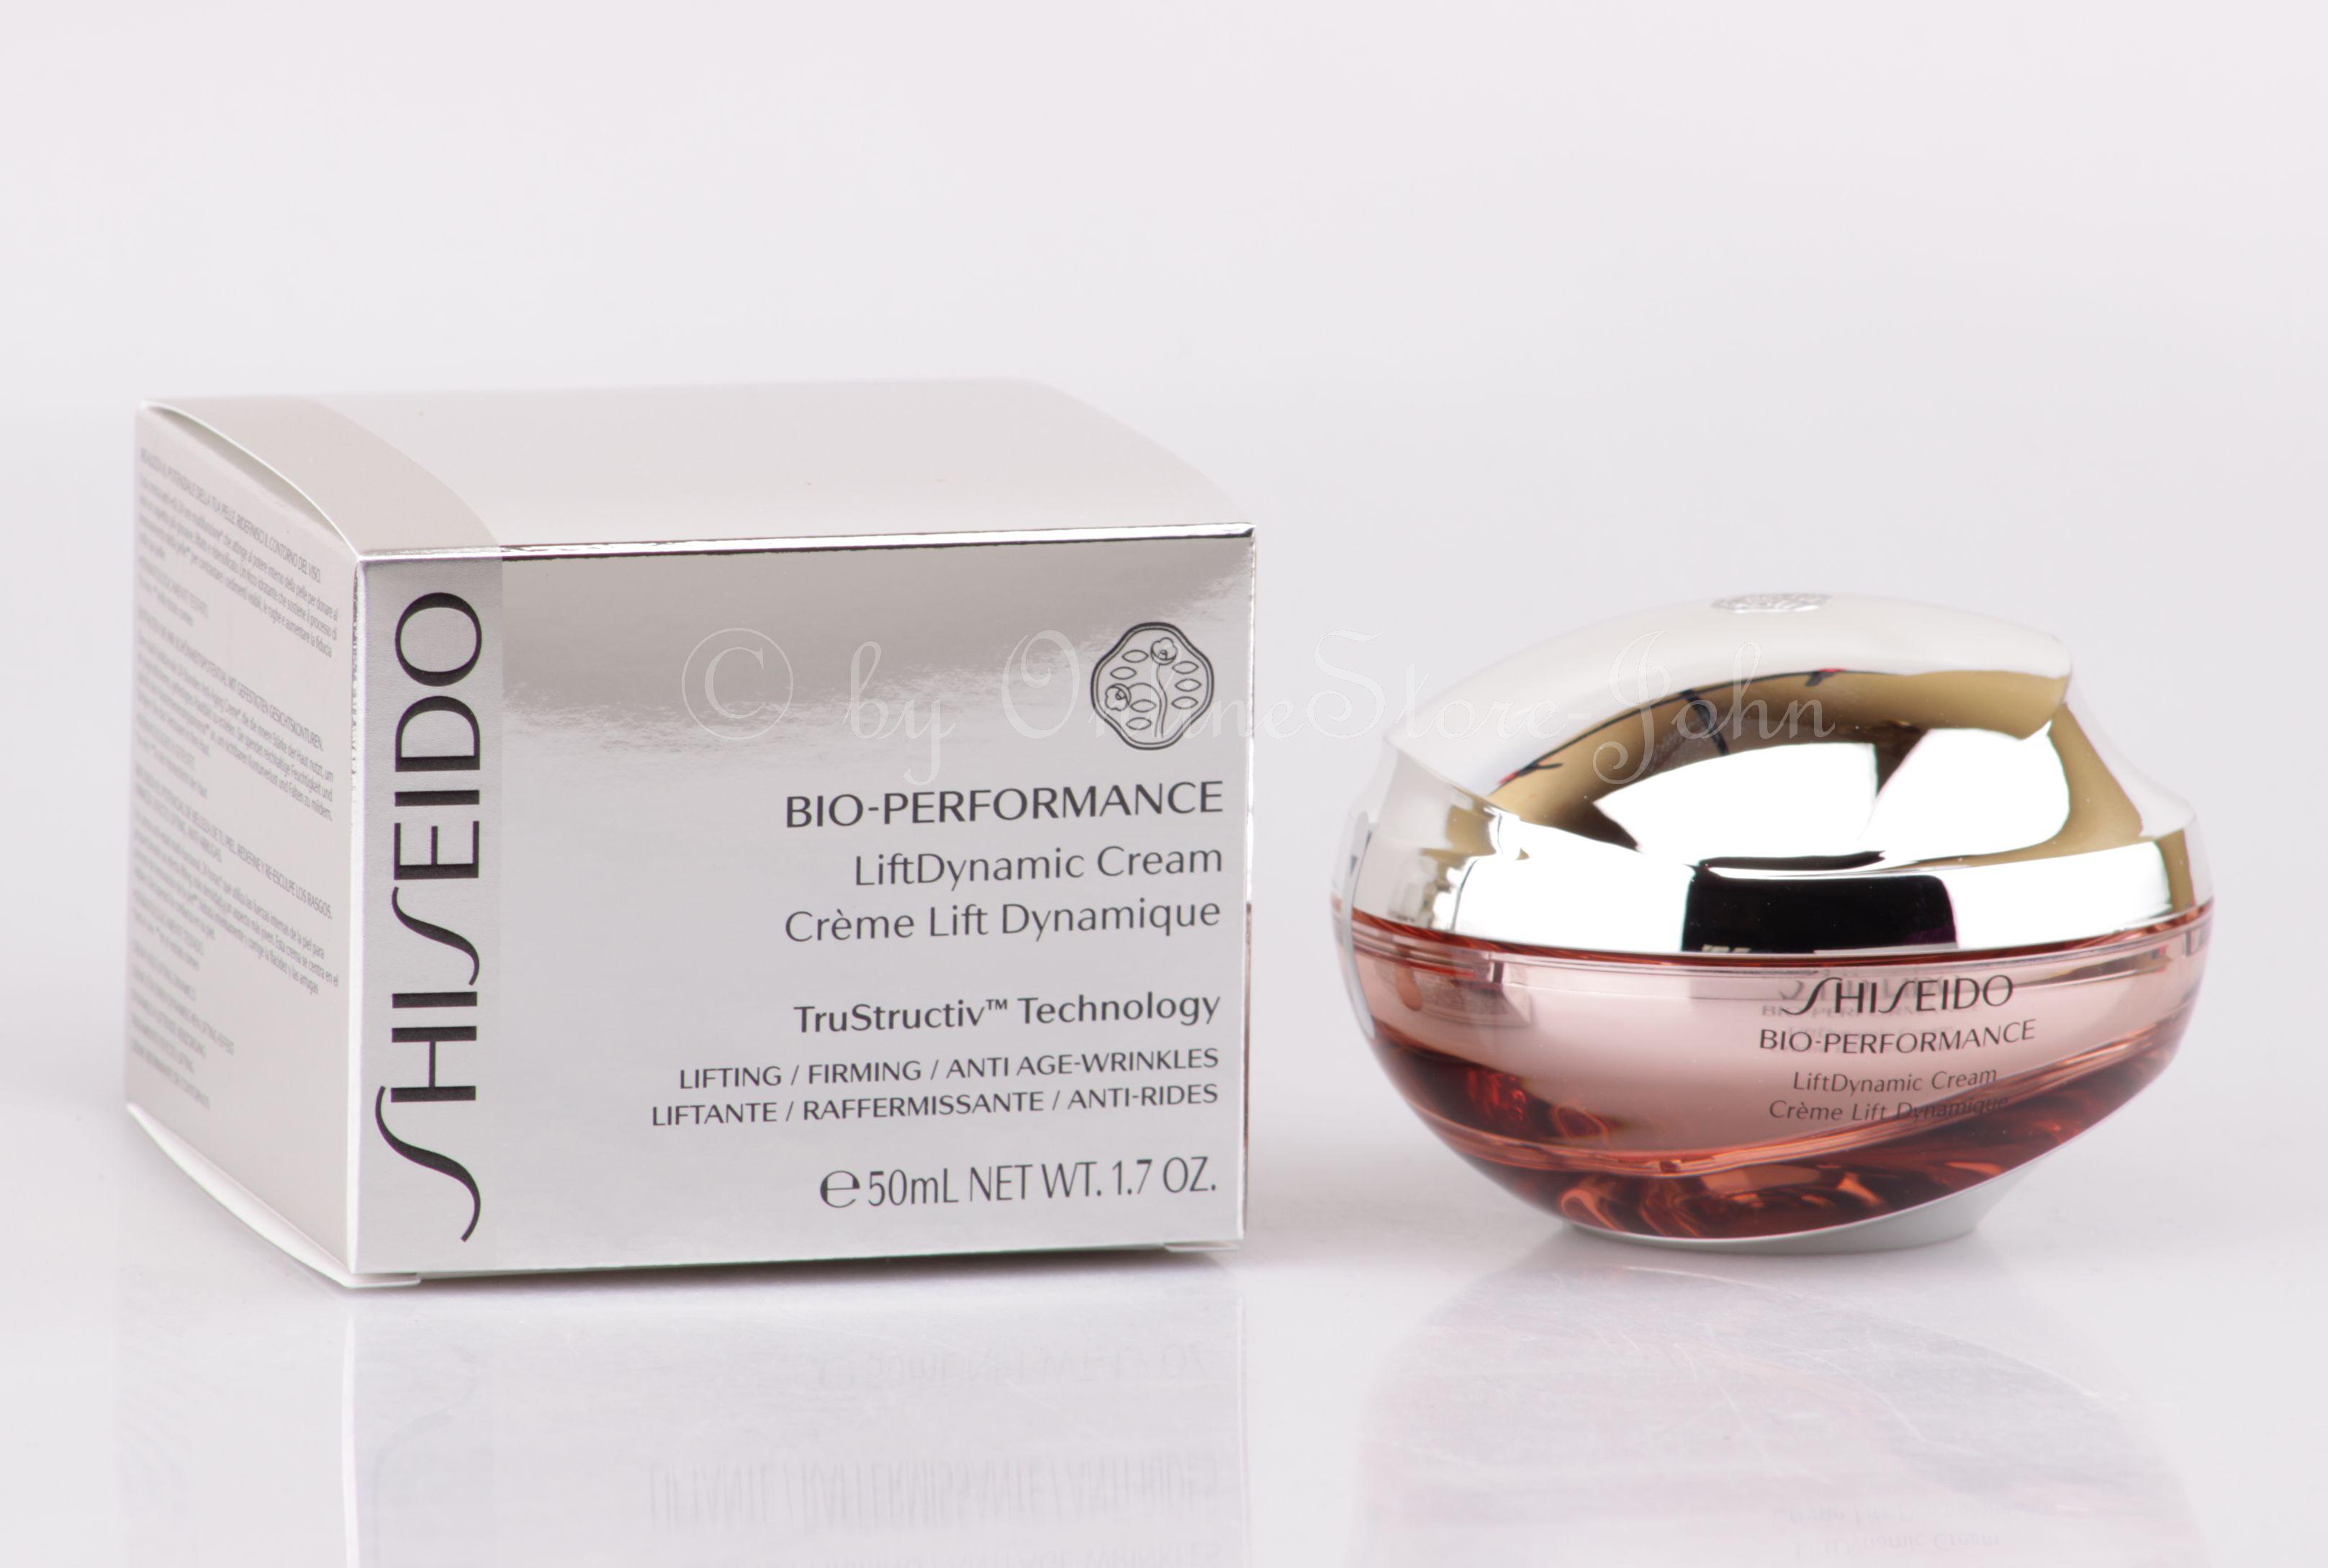 Shiseido Bio-Performance LiftDynamic Cream 50ml推介的圖片搜尋結果